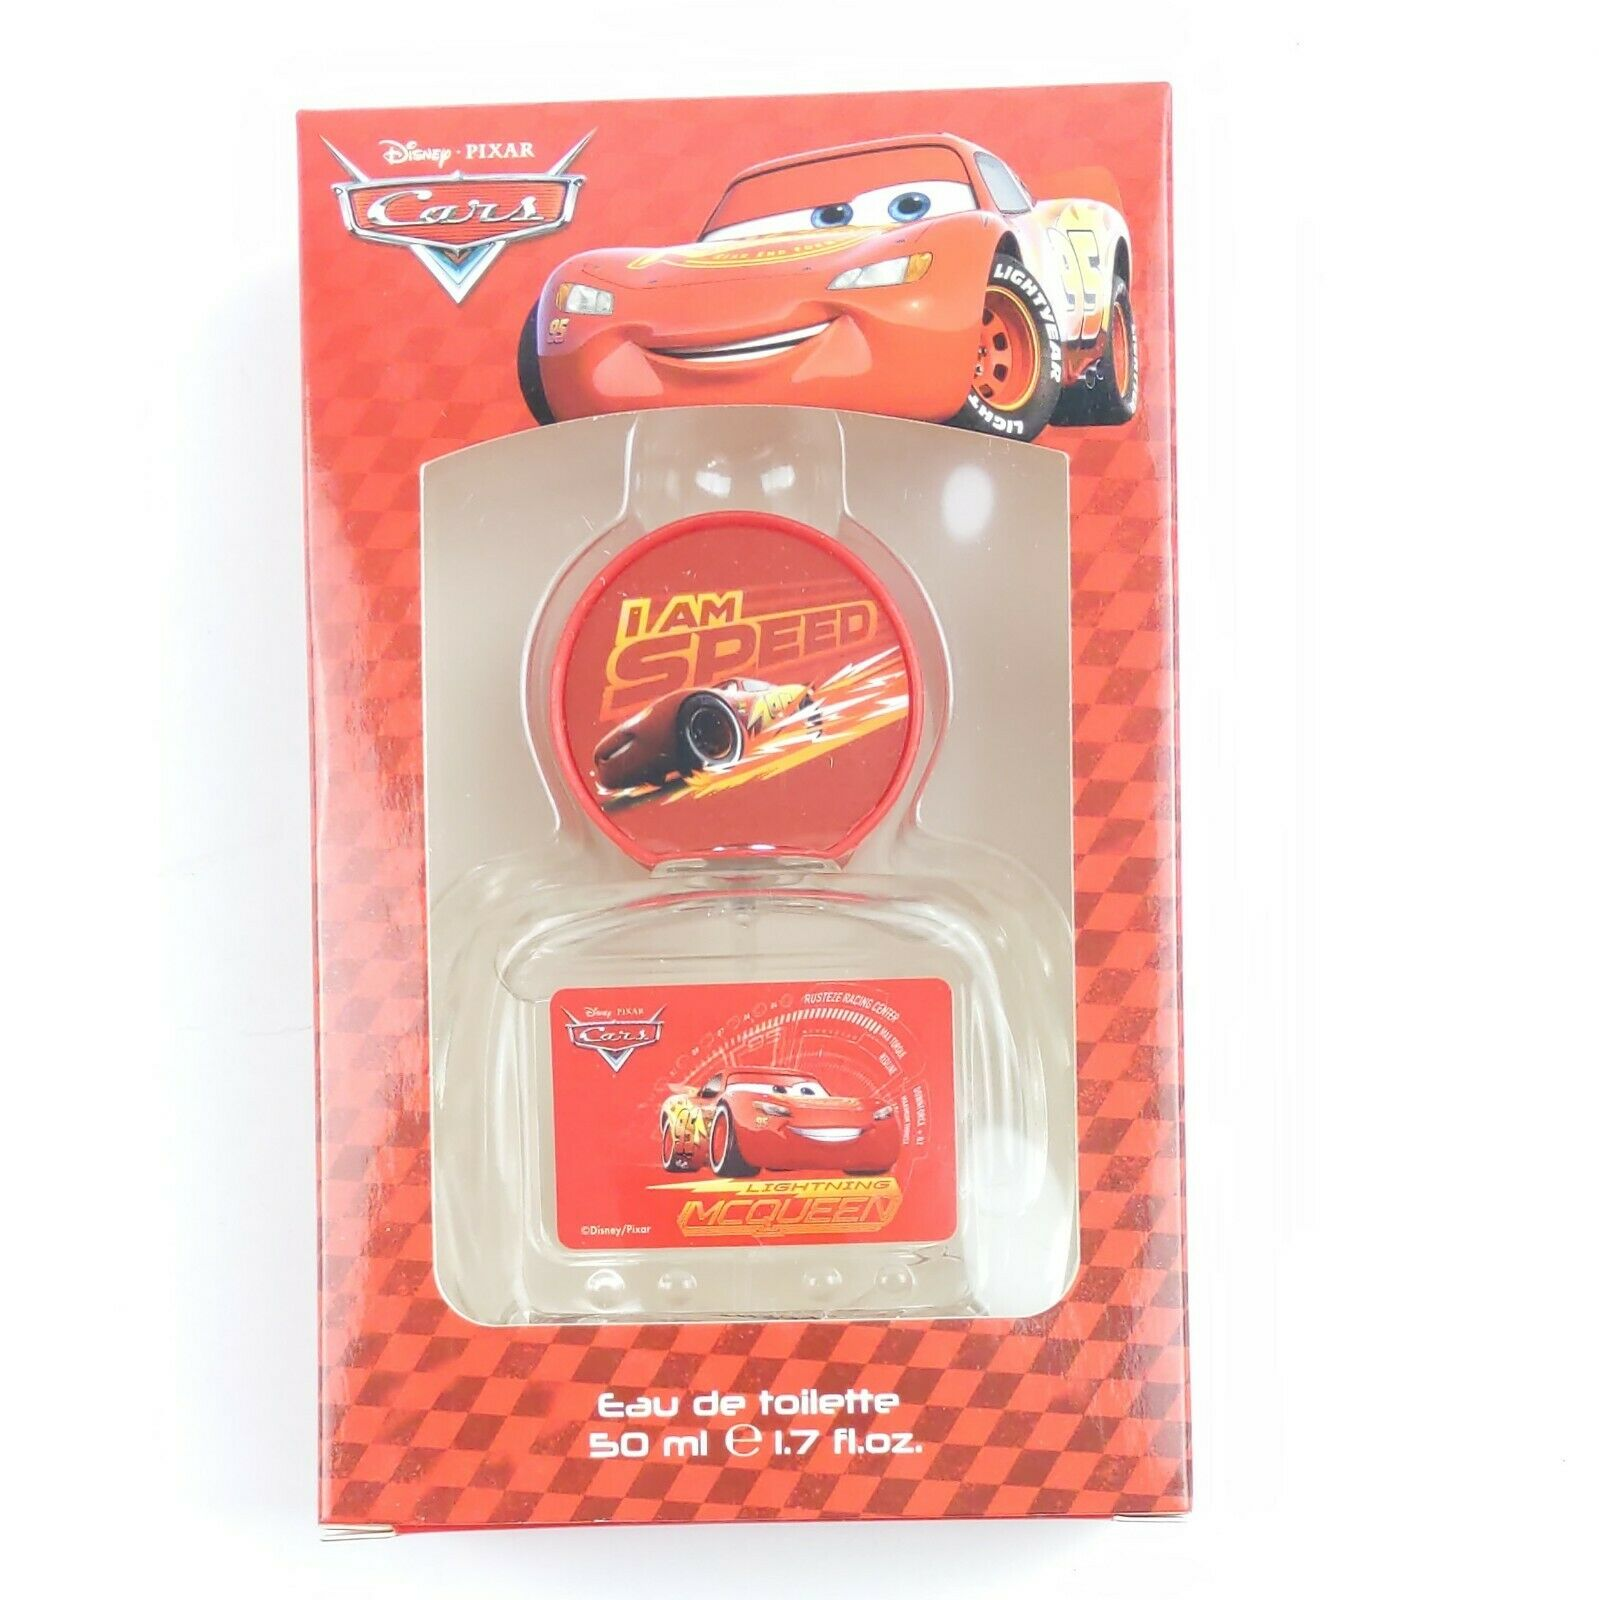 Disney Pixar Automobiles Eau de Toilette Cologne Spray 1.7 ouncesKids Lightning Mcqueen